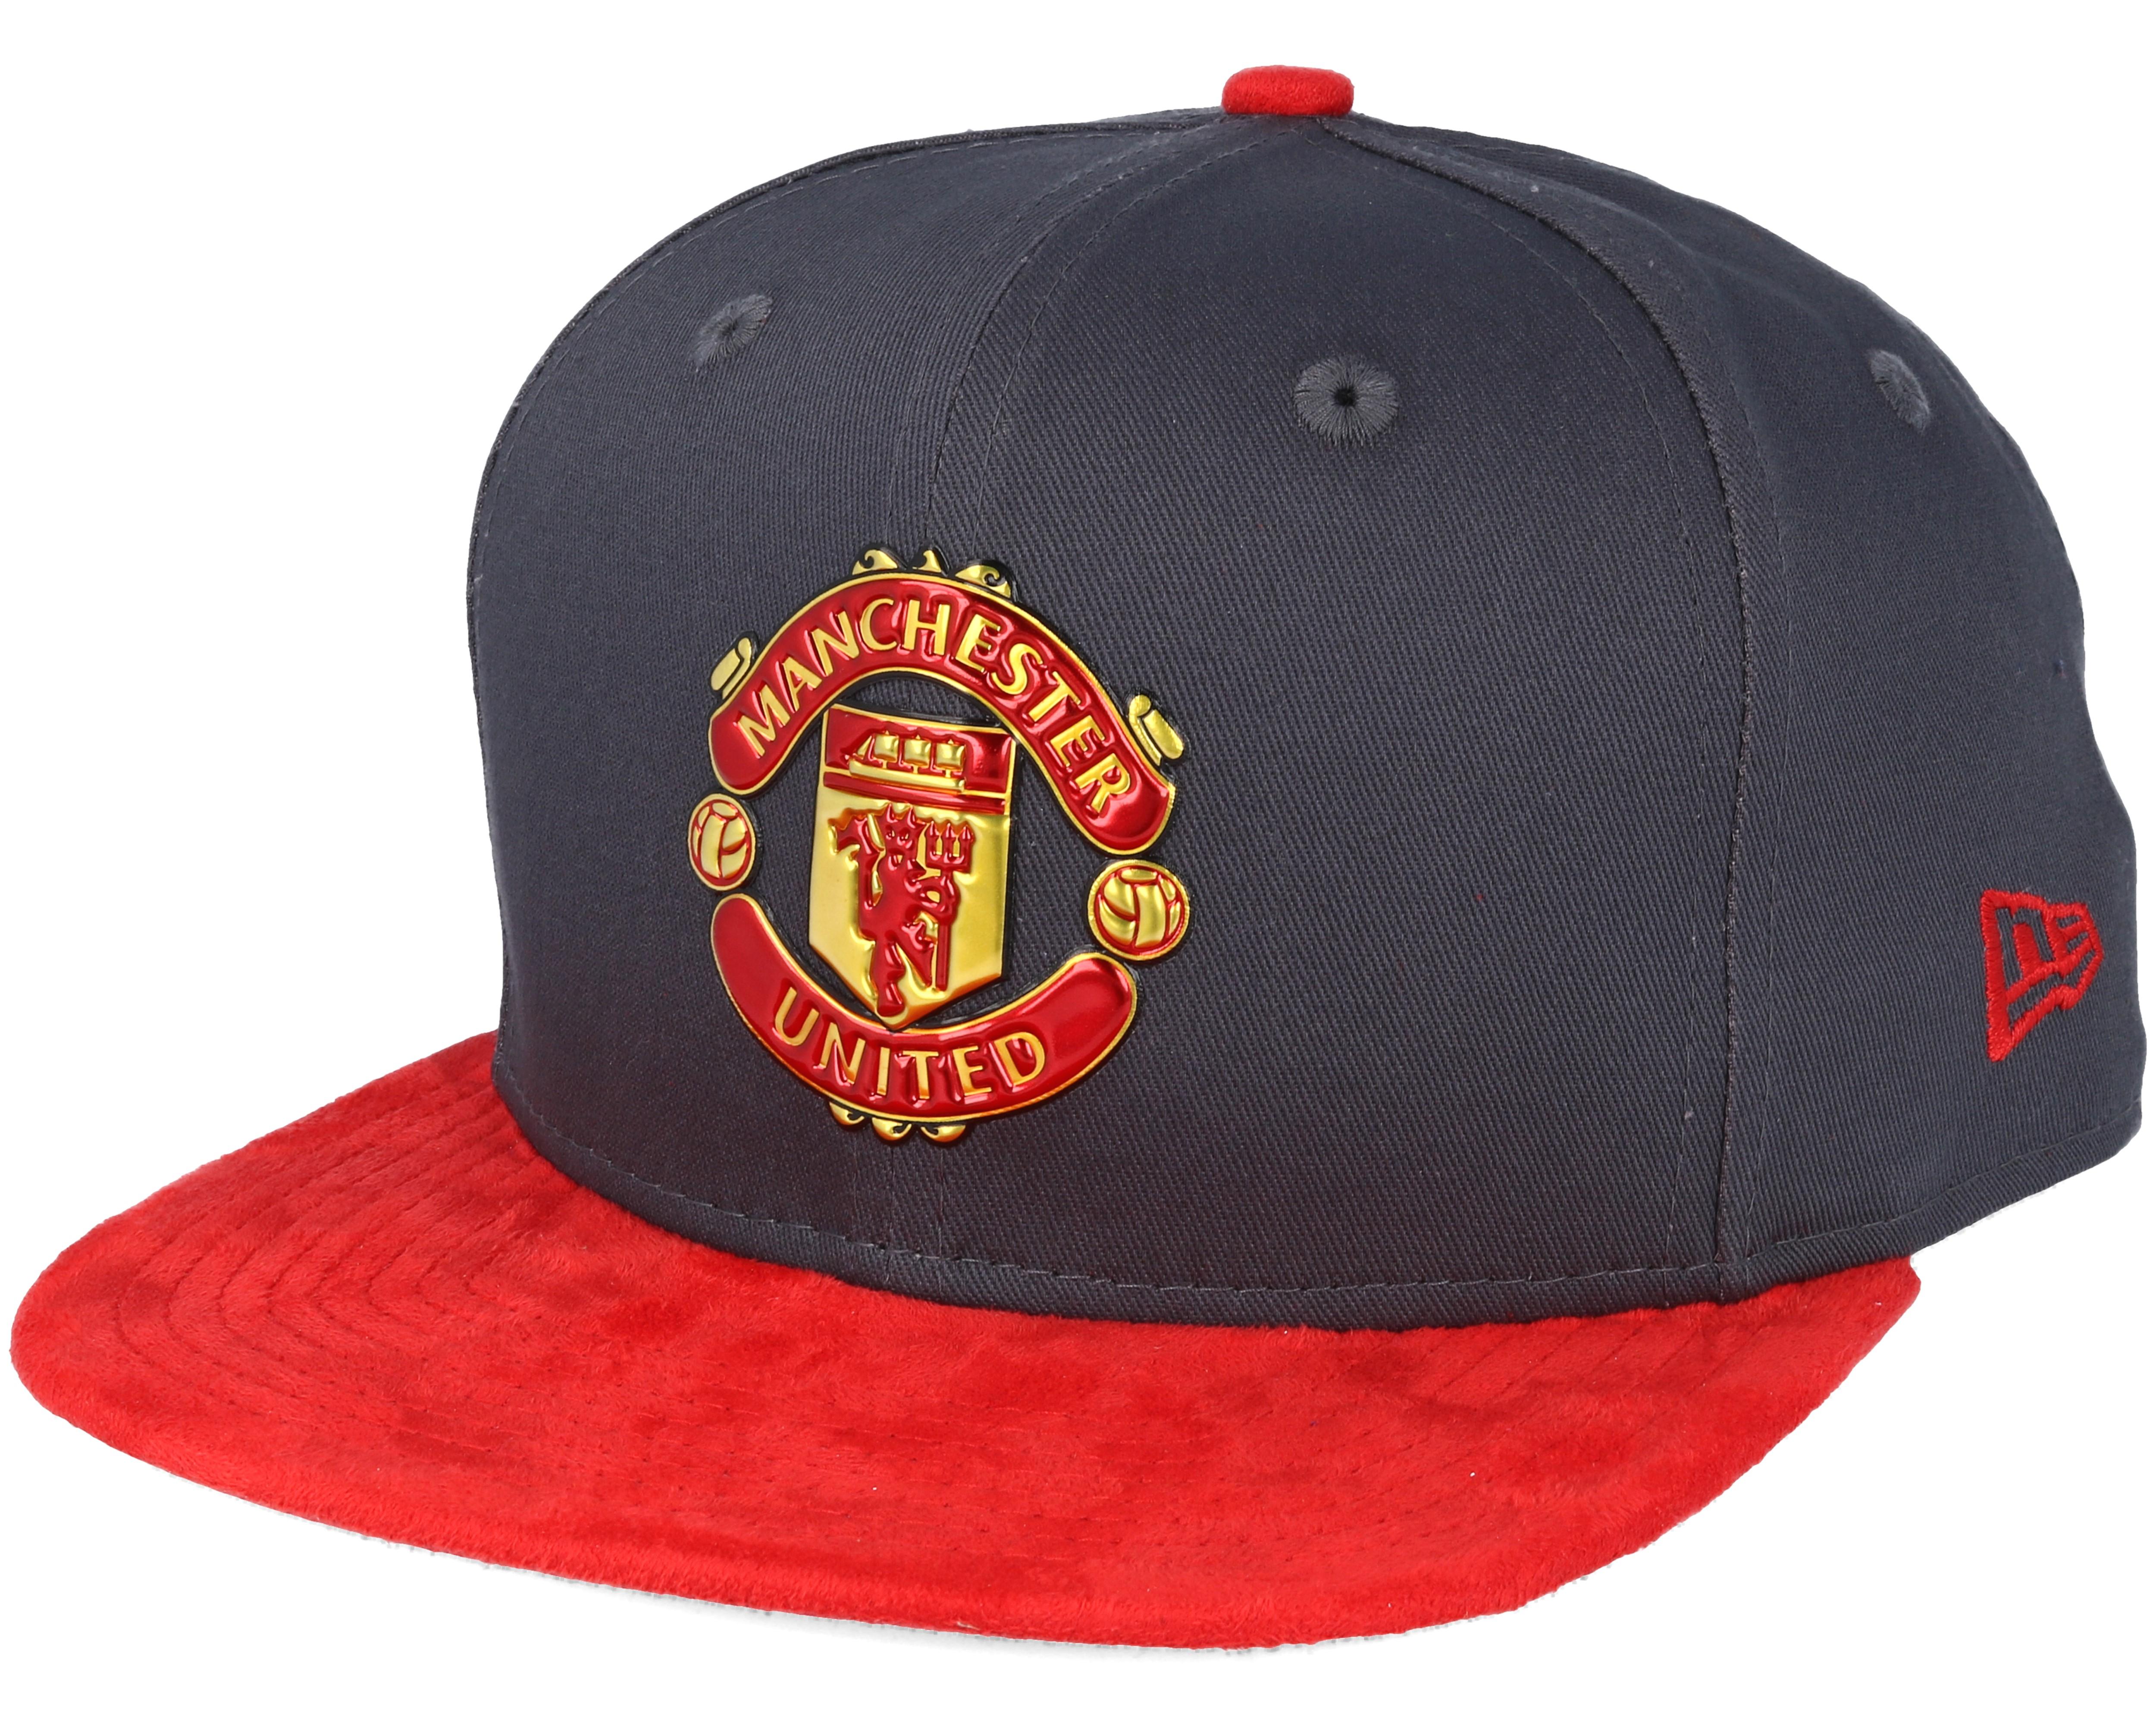 manchester united suede visor 9fifty grey red snapback new era caps. Black Bedroom Furniture Sets. Home Design Ideas